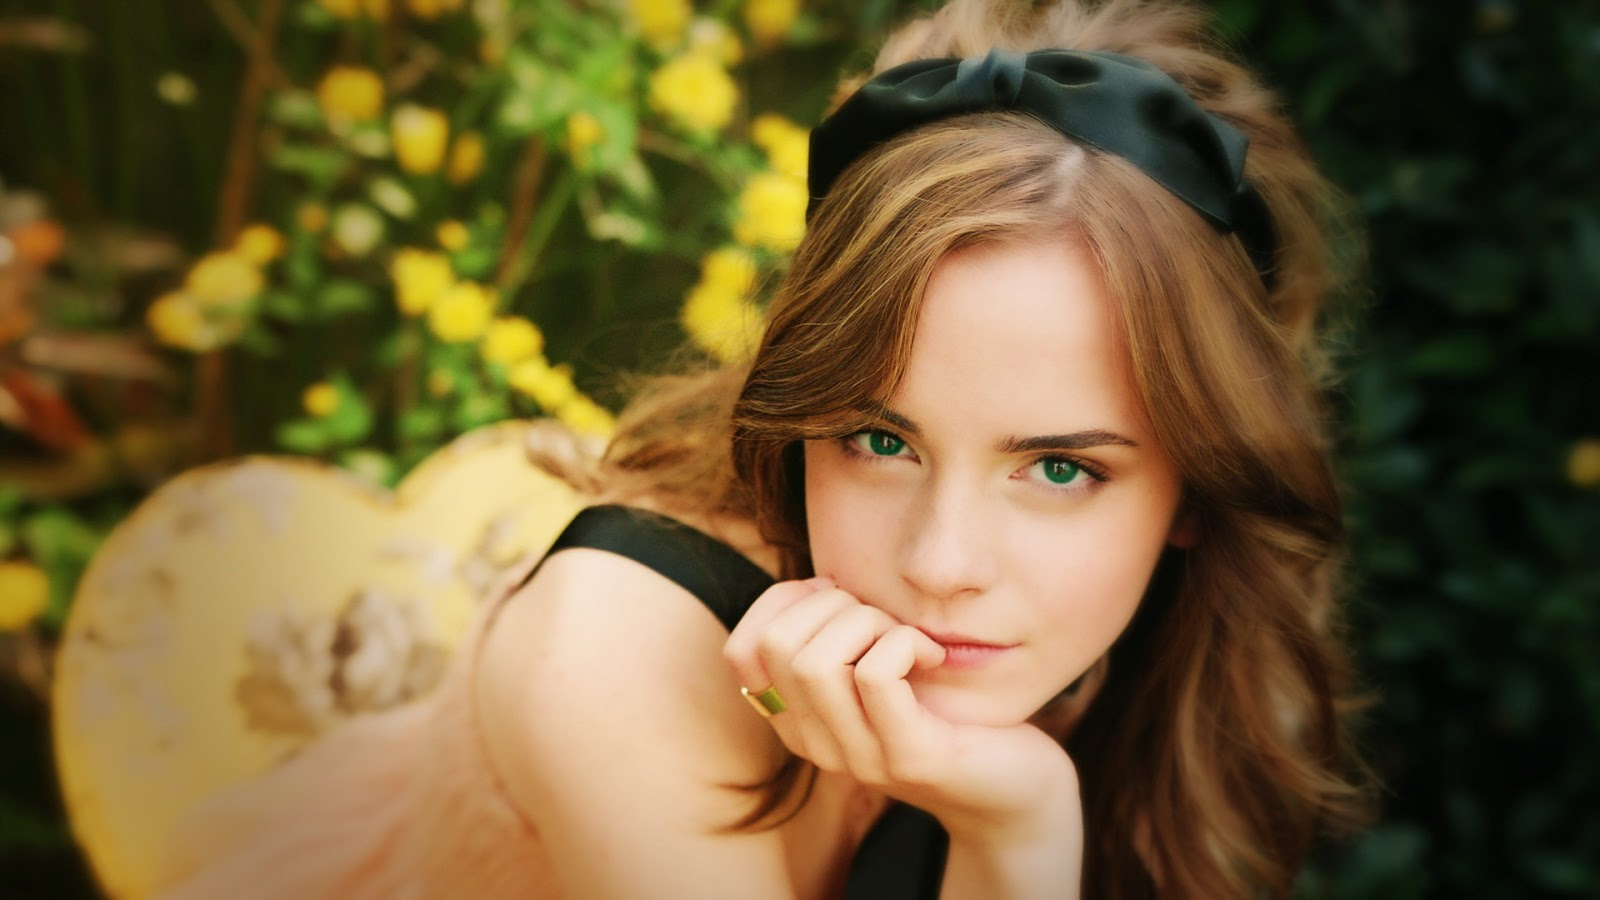 48 Beautiful Women Hd Wallpaper On Wallpapersafari